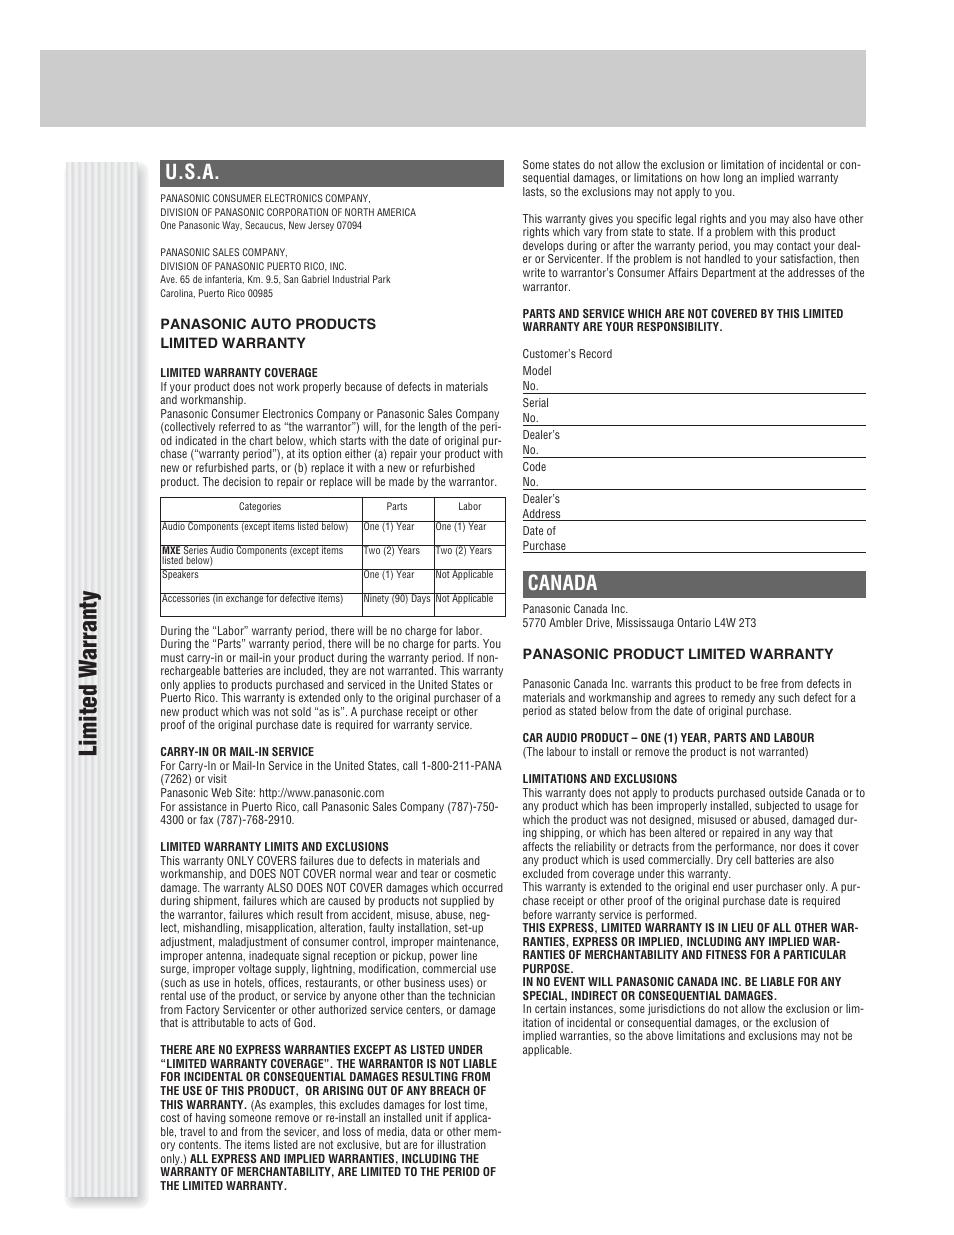 Panasonic Cq C1333u Wiring Diagram Schematics And Diagrams Car Stereo Also Cp134u Limited W A Rranty U S Canada User Manual